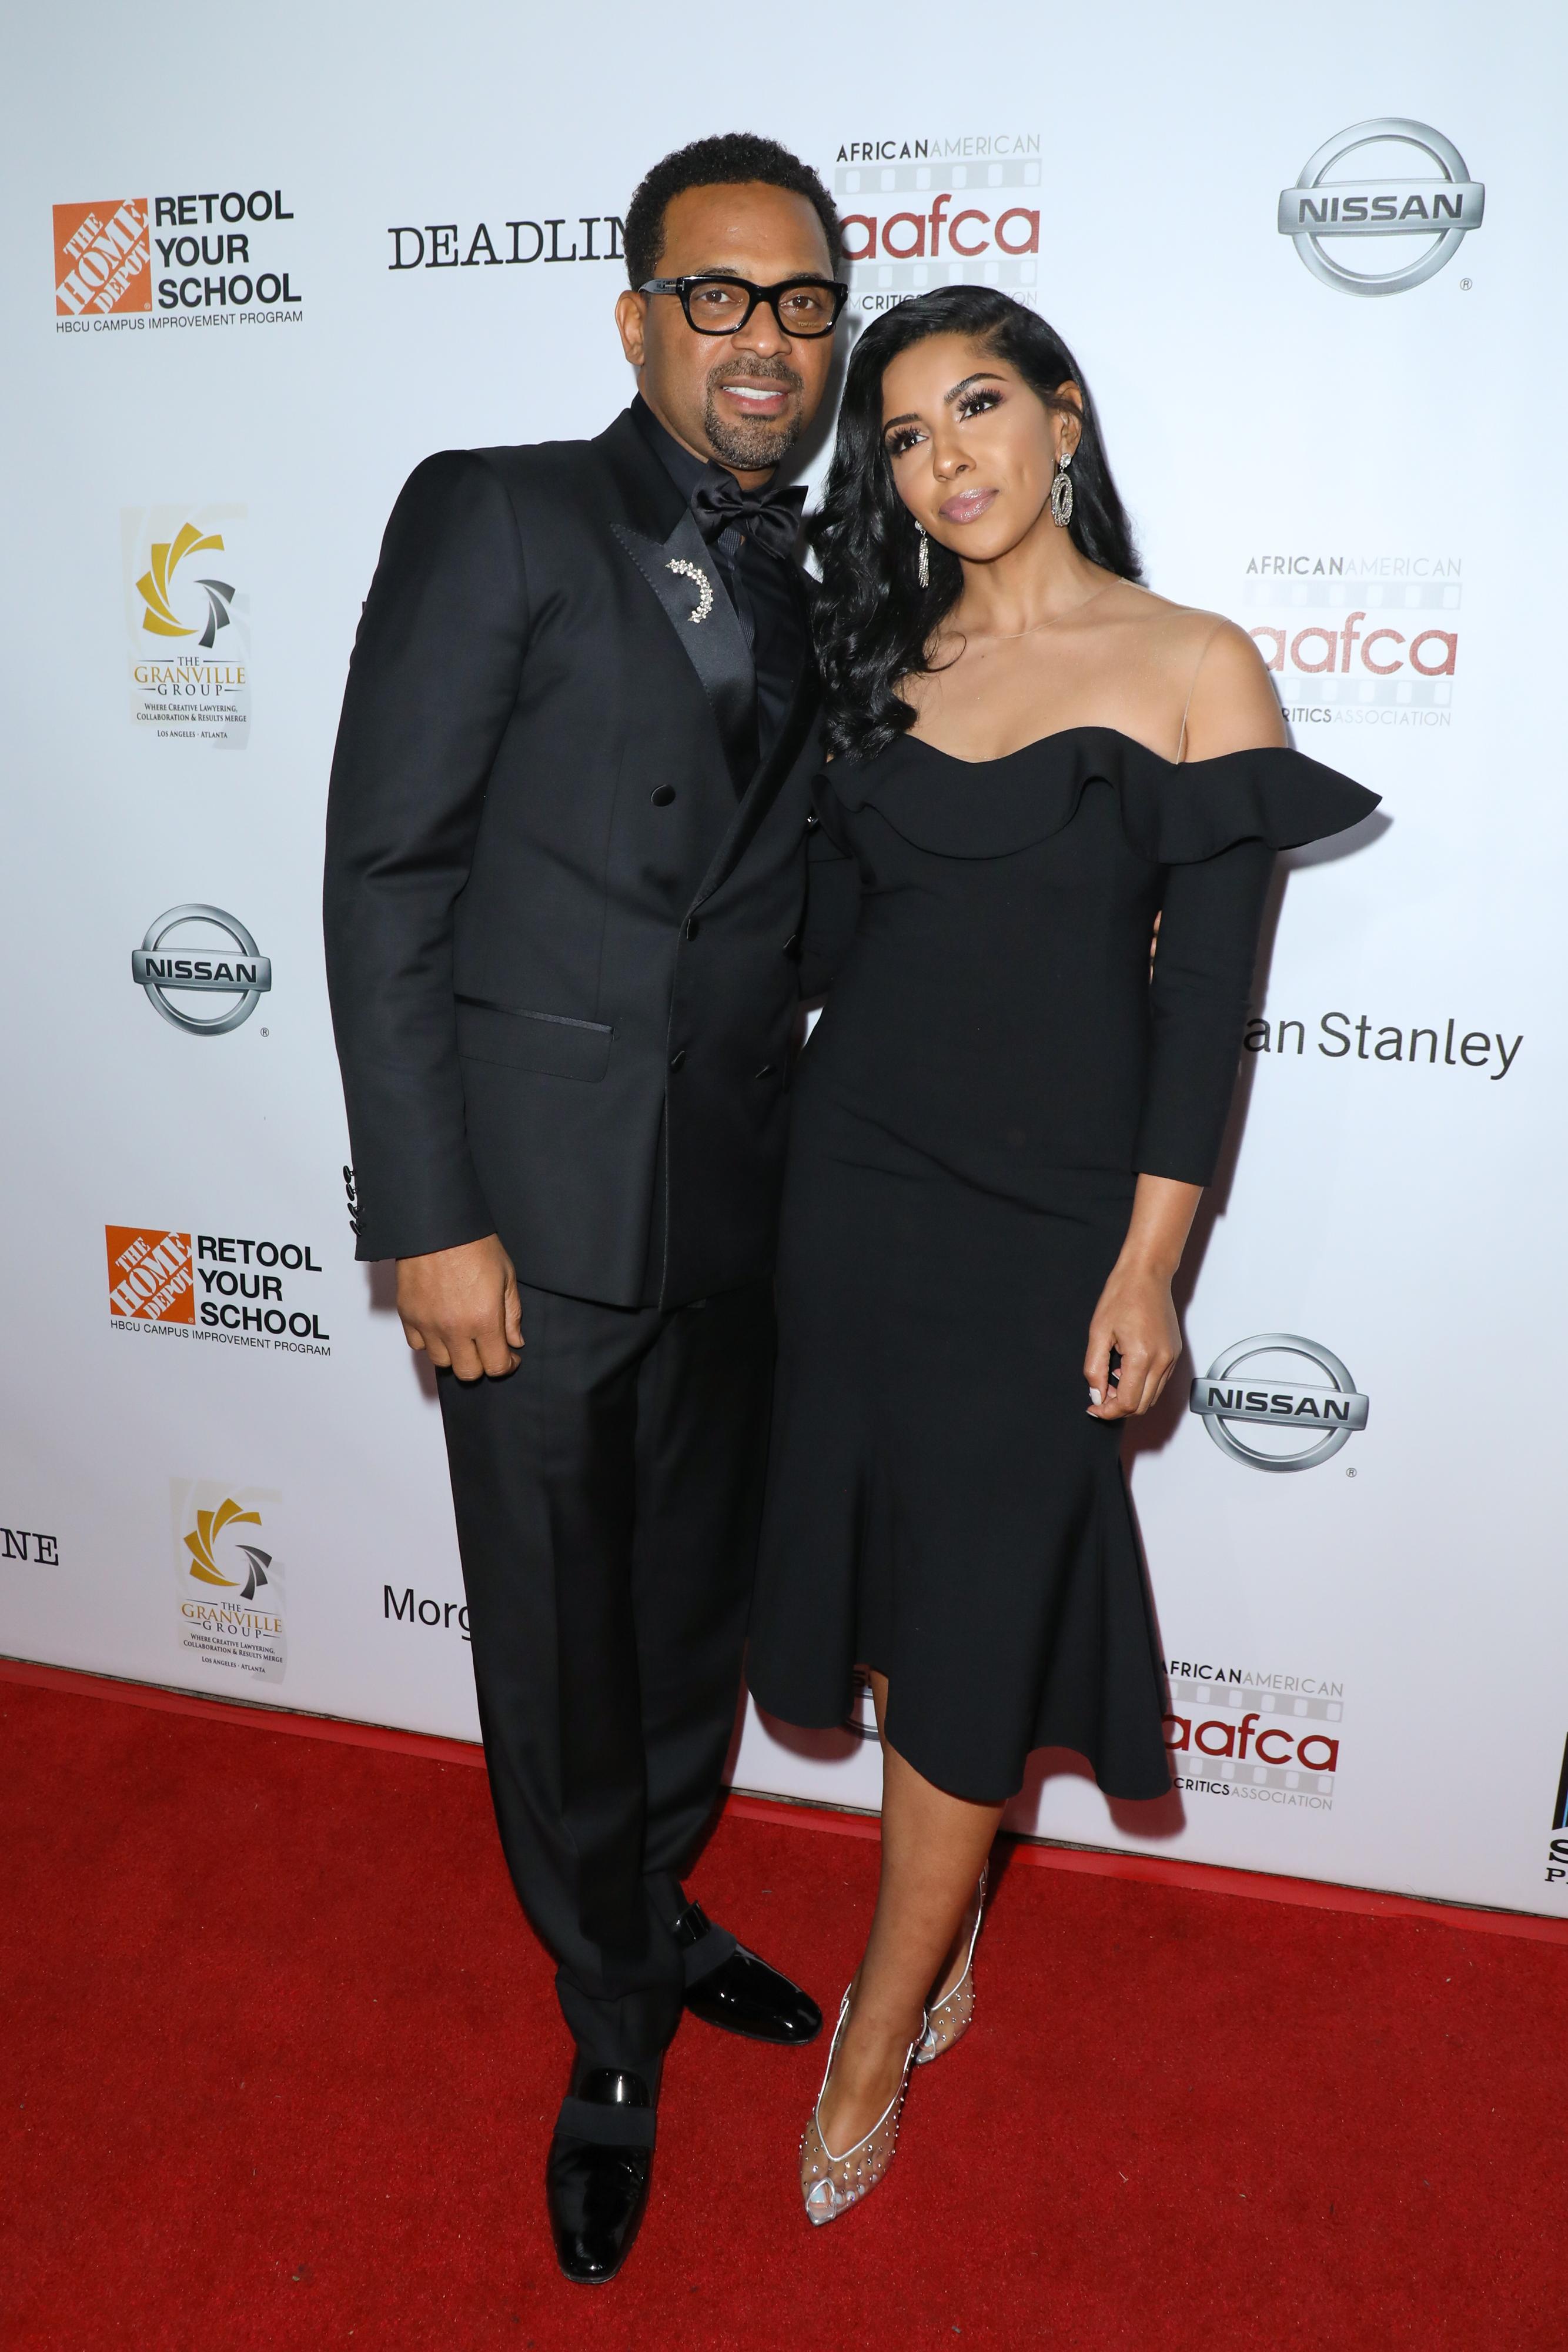 9th Annual African American Film Critics Association (AAFCA) Awards